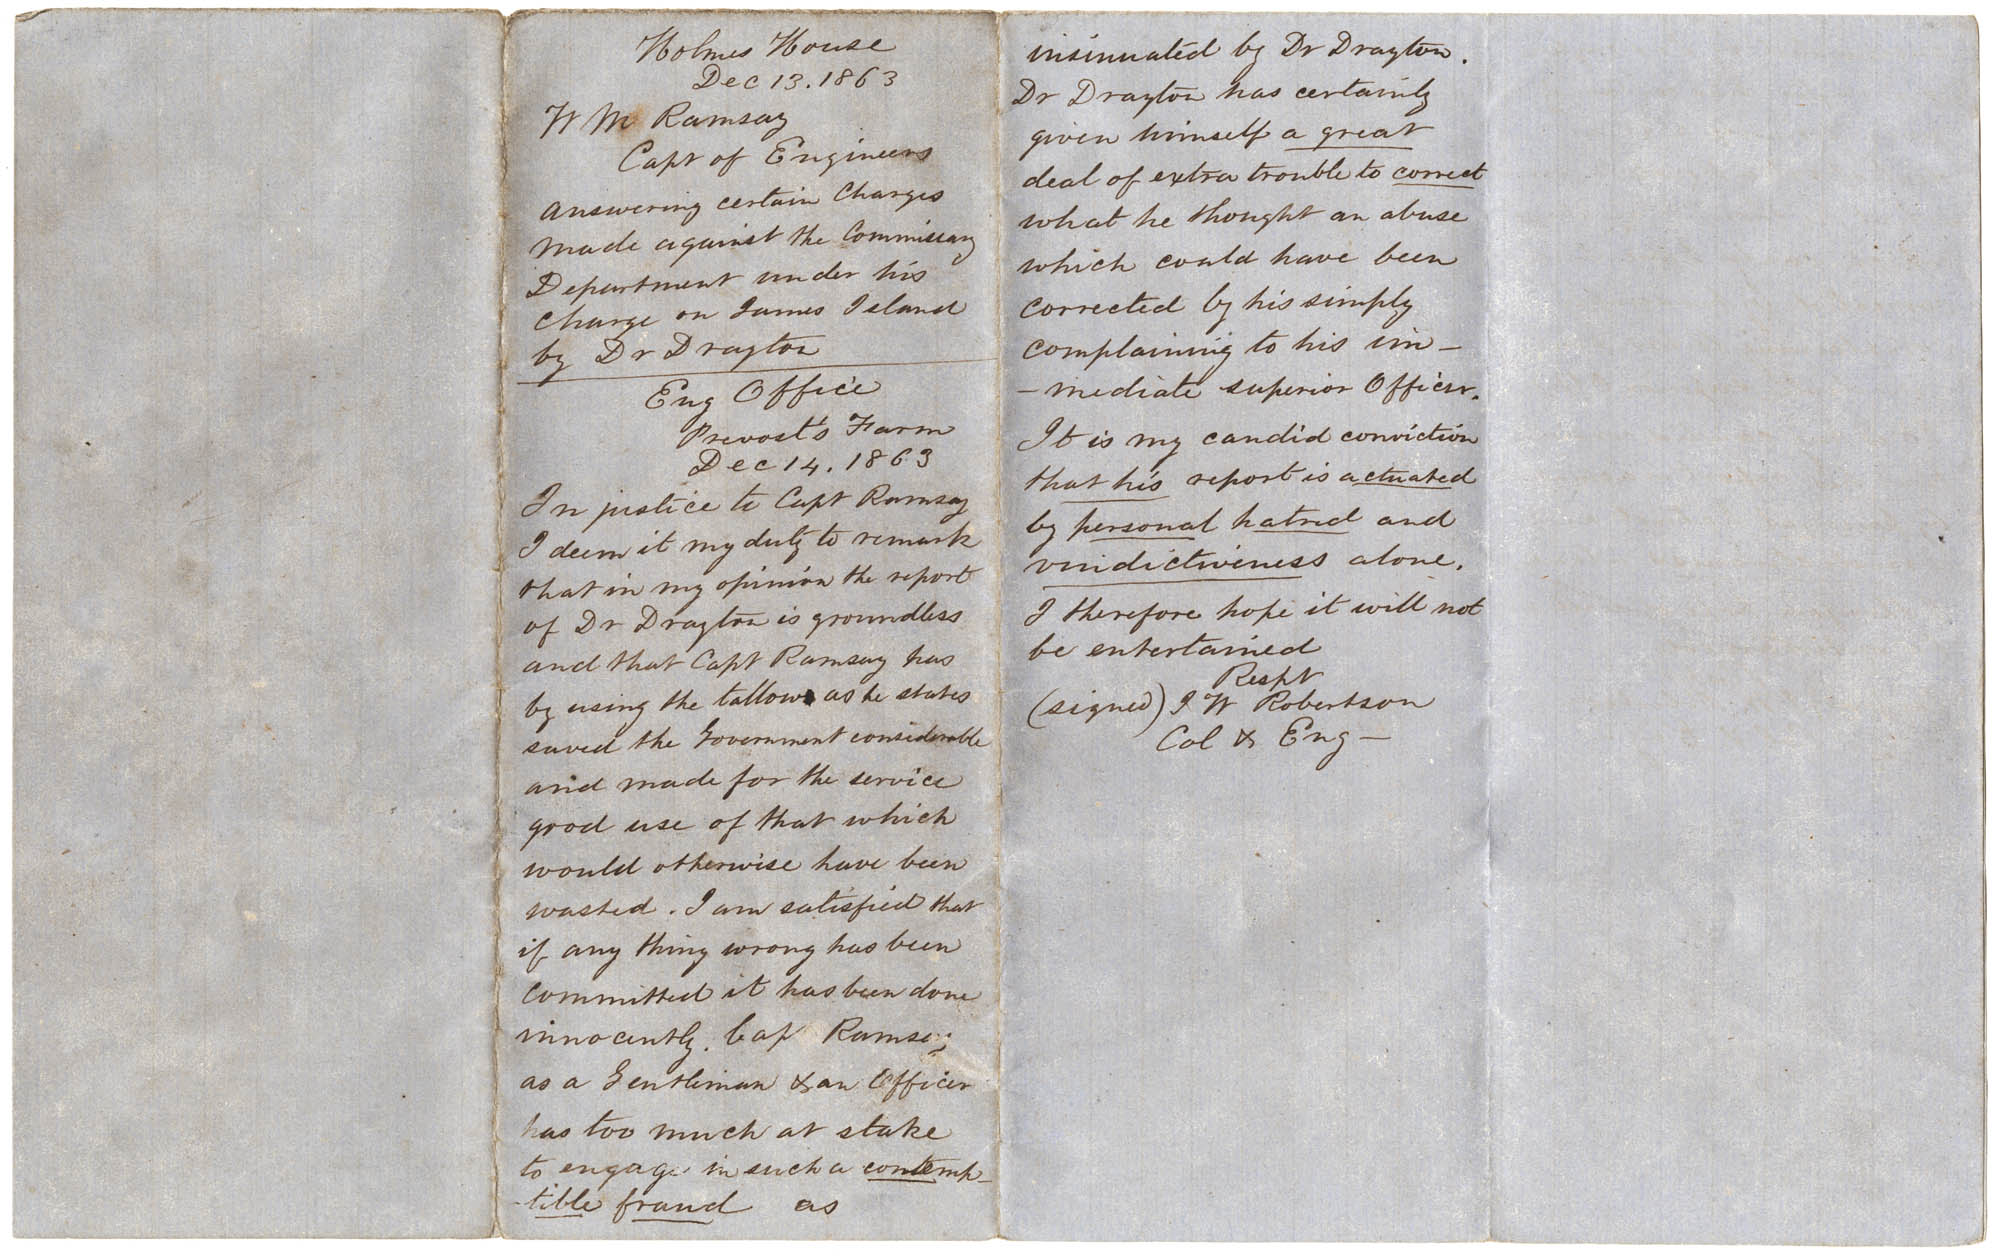 William Ramsay to D.B. Harris